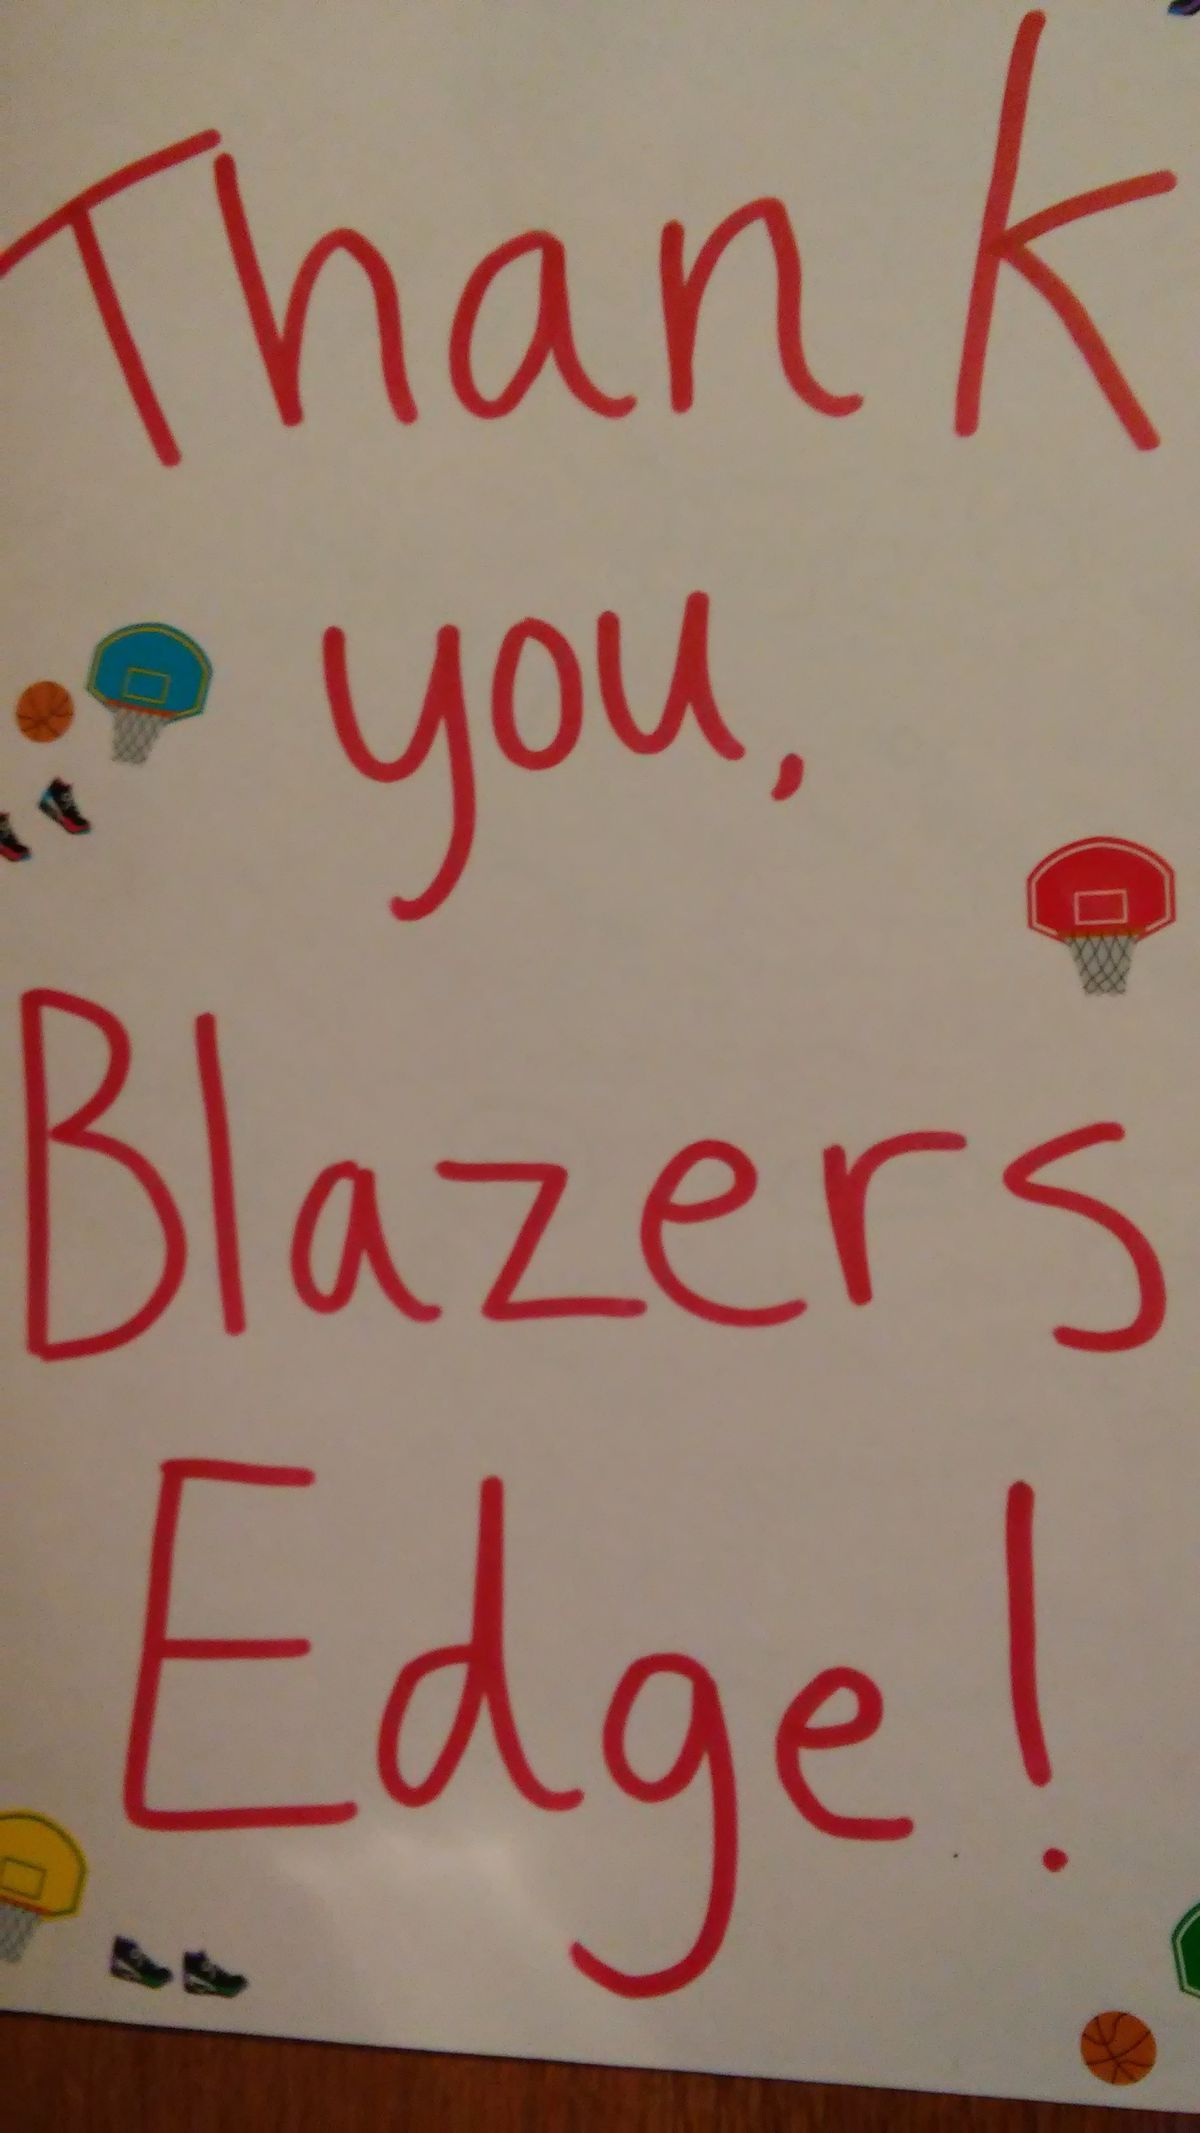 Blazers Edge Night Card1a